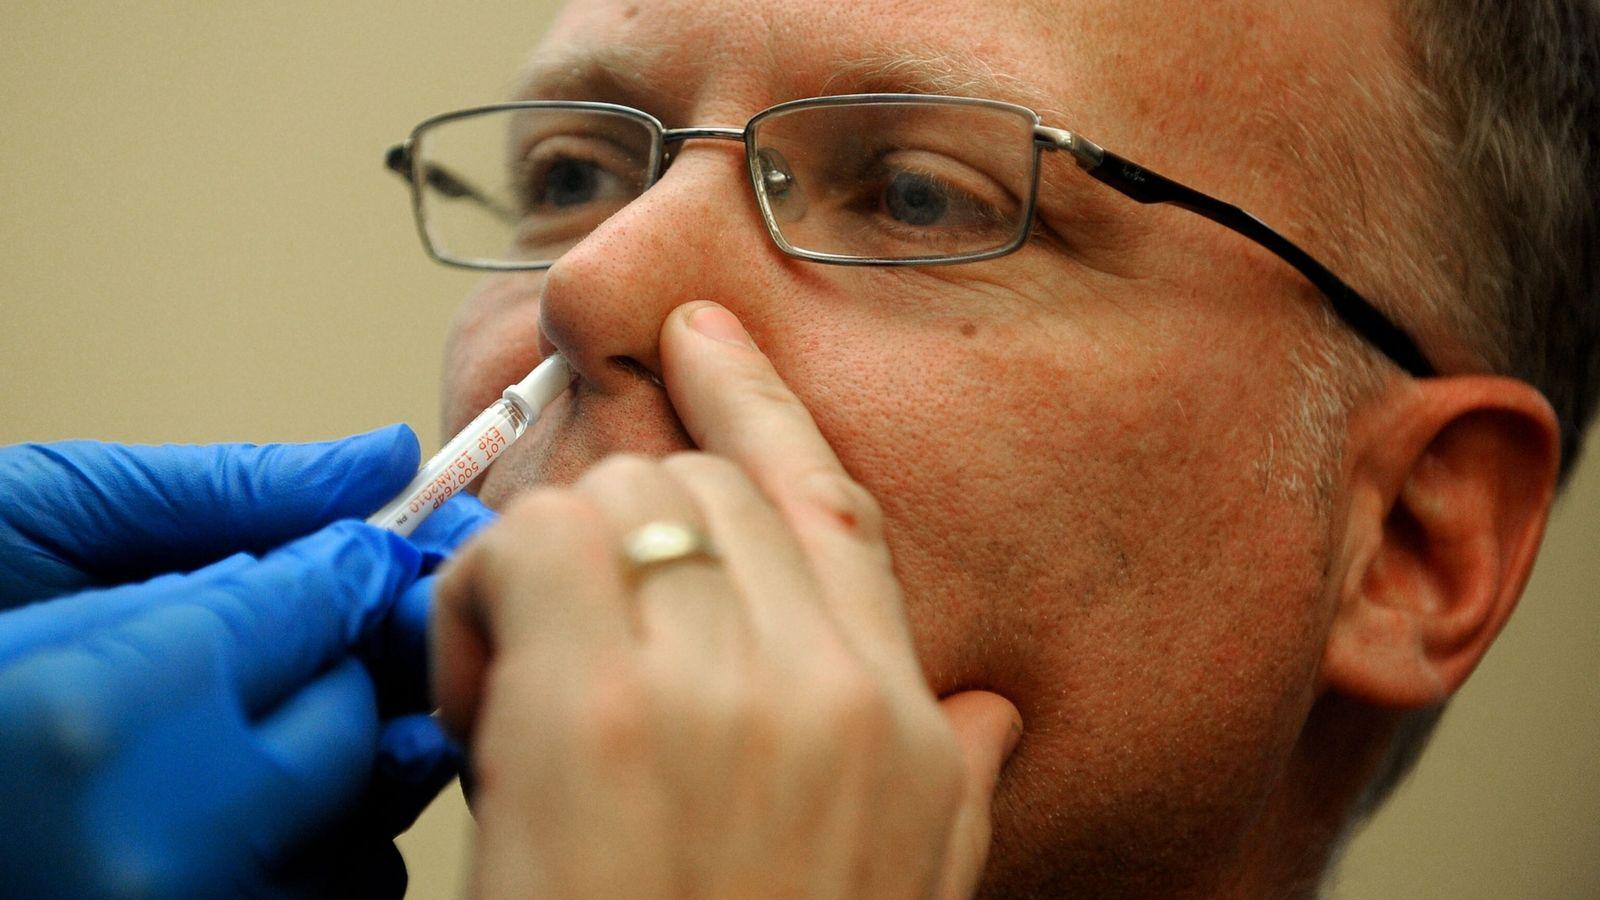 H1N1 Vacina intranasal